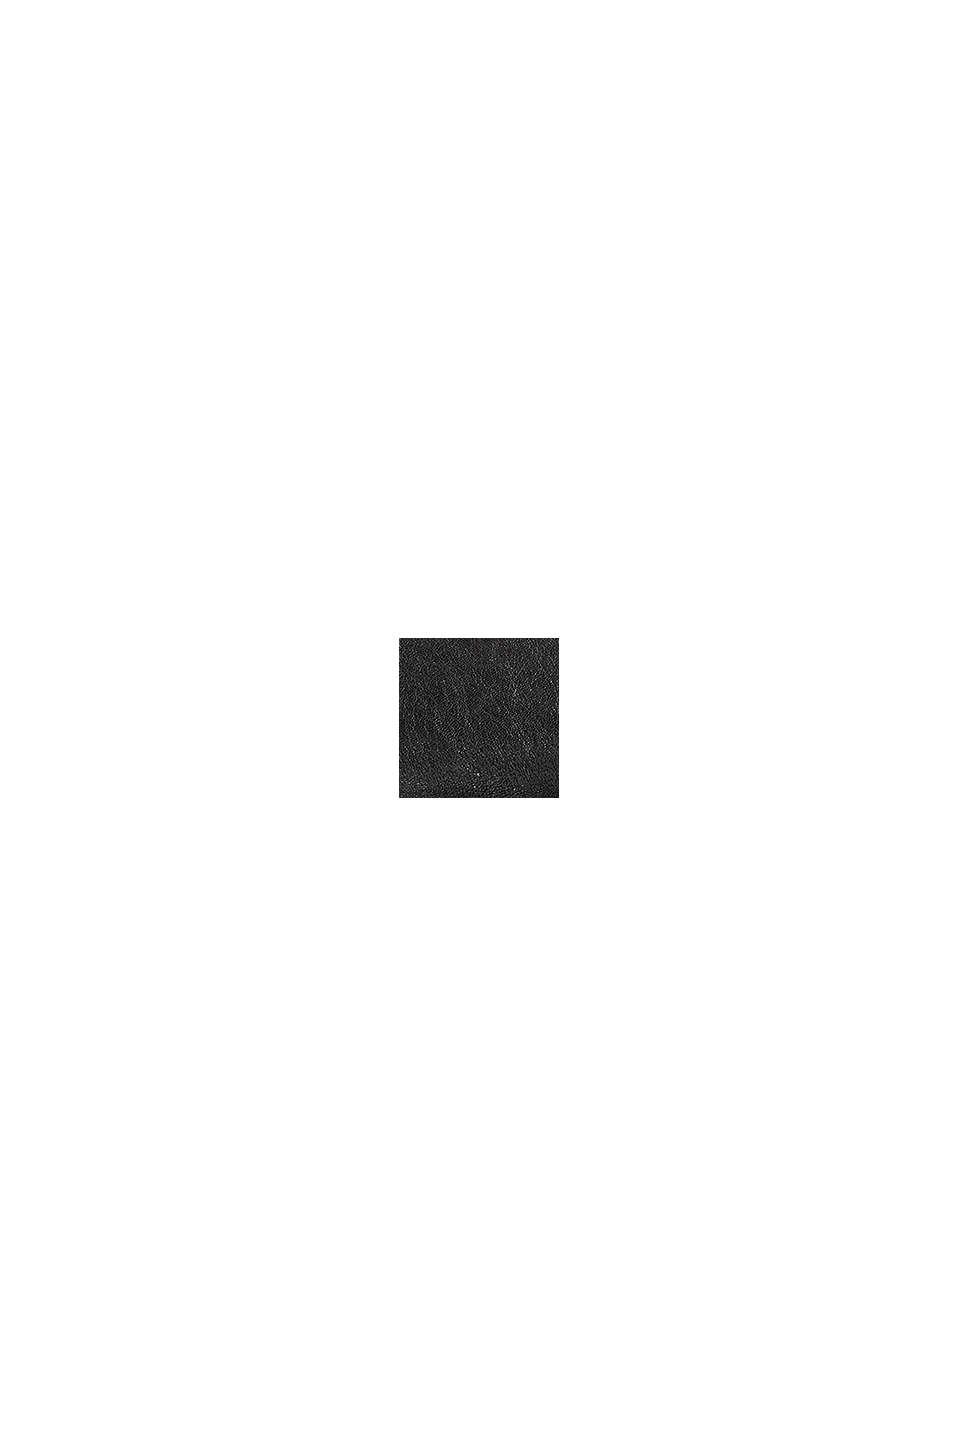 Sac bandoulière en similicuir, BLACK, swatch